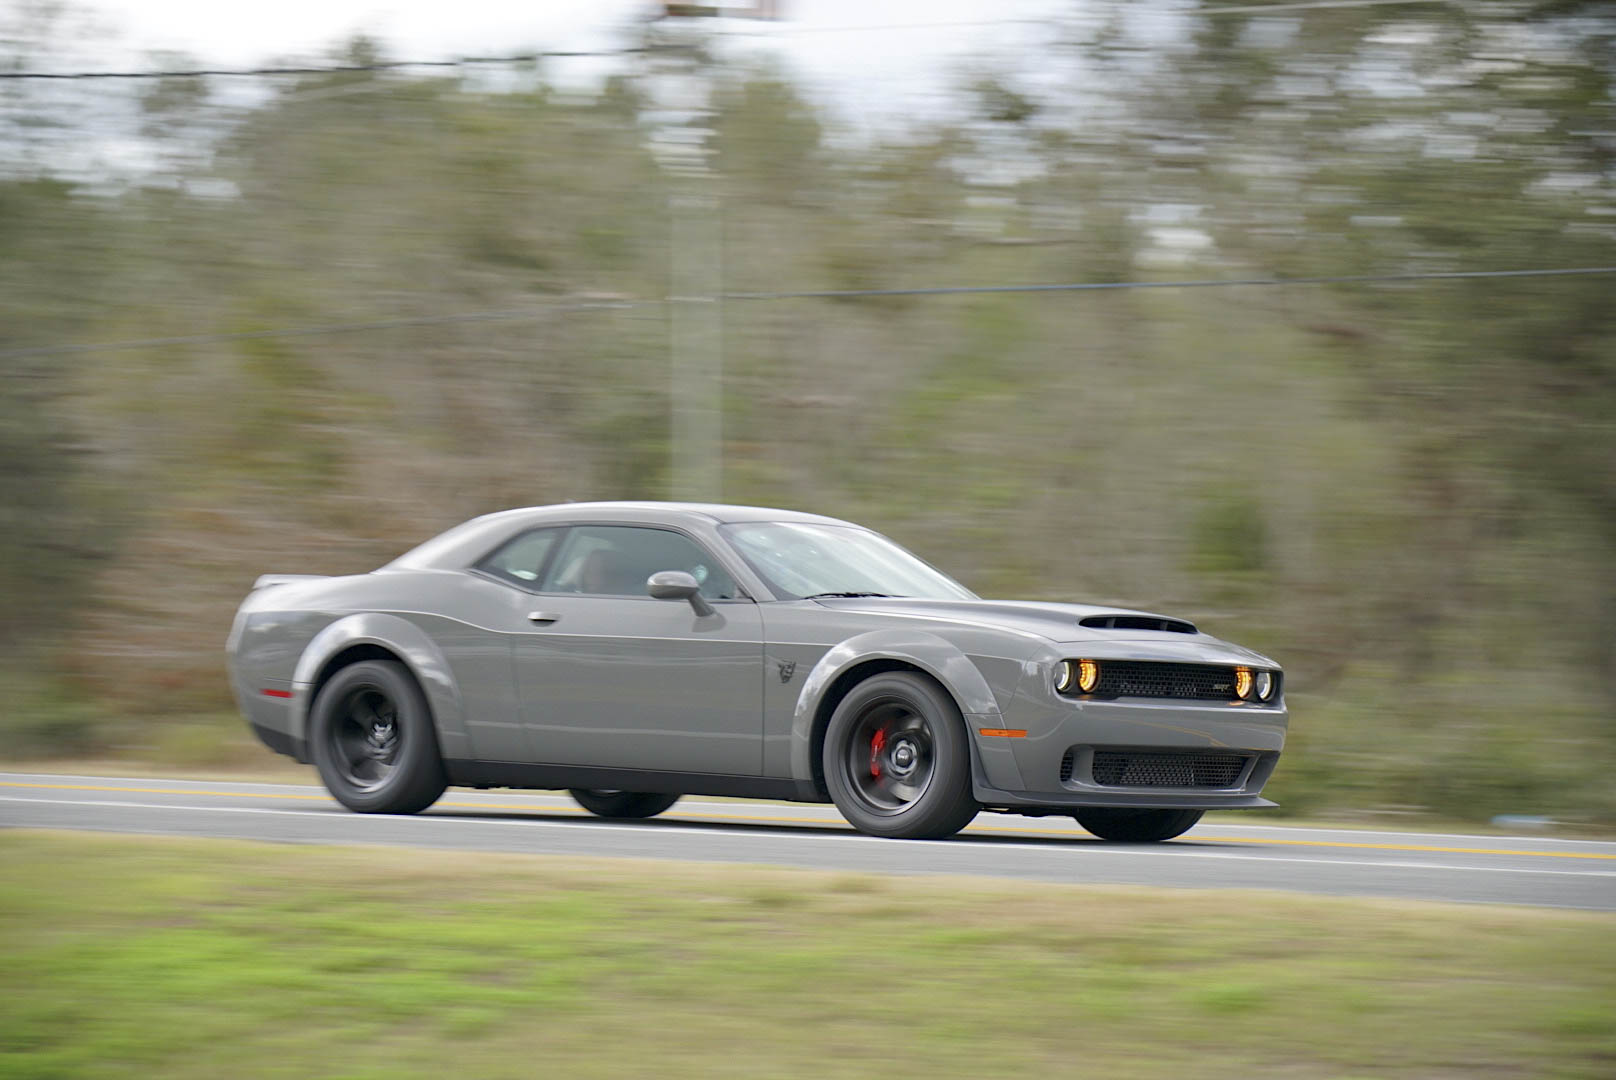 2018 Dodge Challenger SRT Demon driving